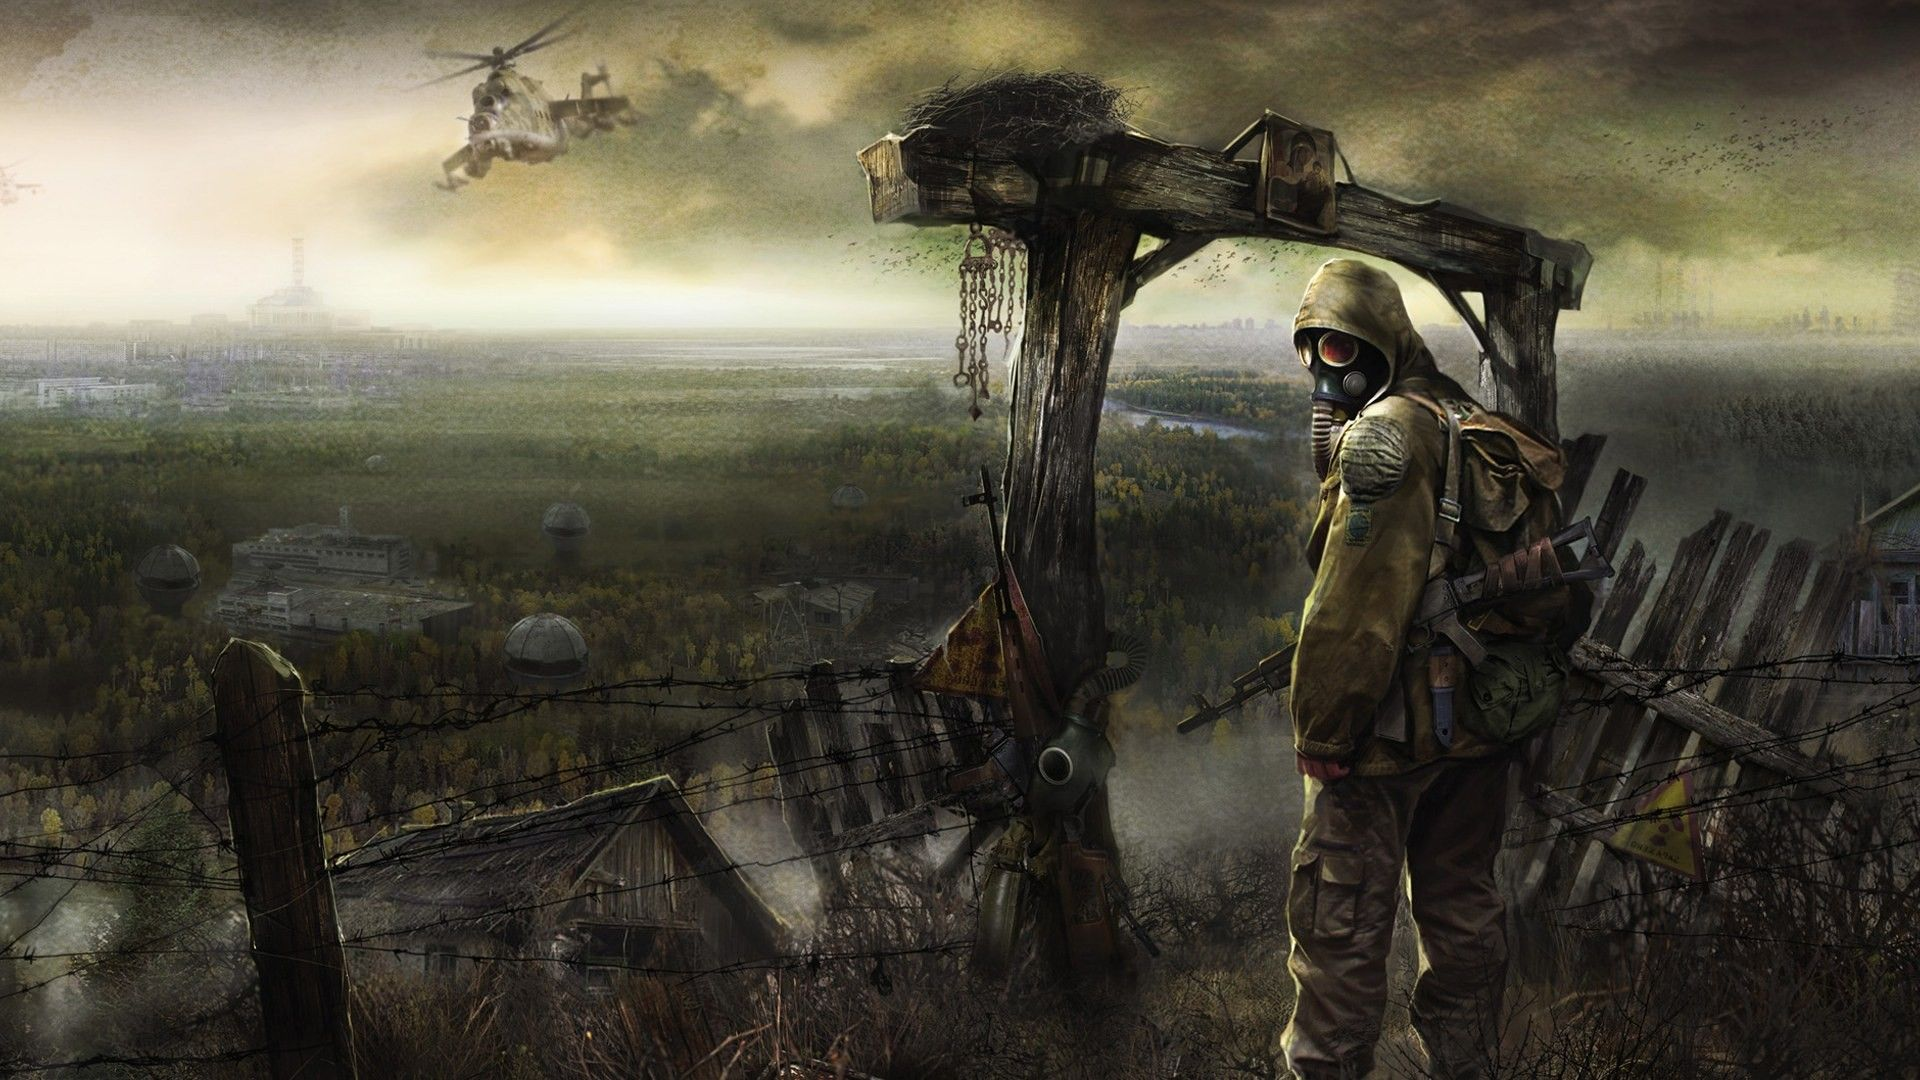 Pripyat Futuristic Apocalyptic Video Games S T A L K E R